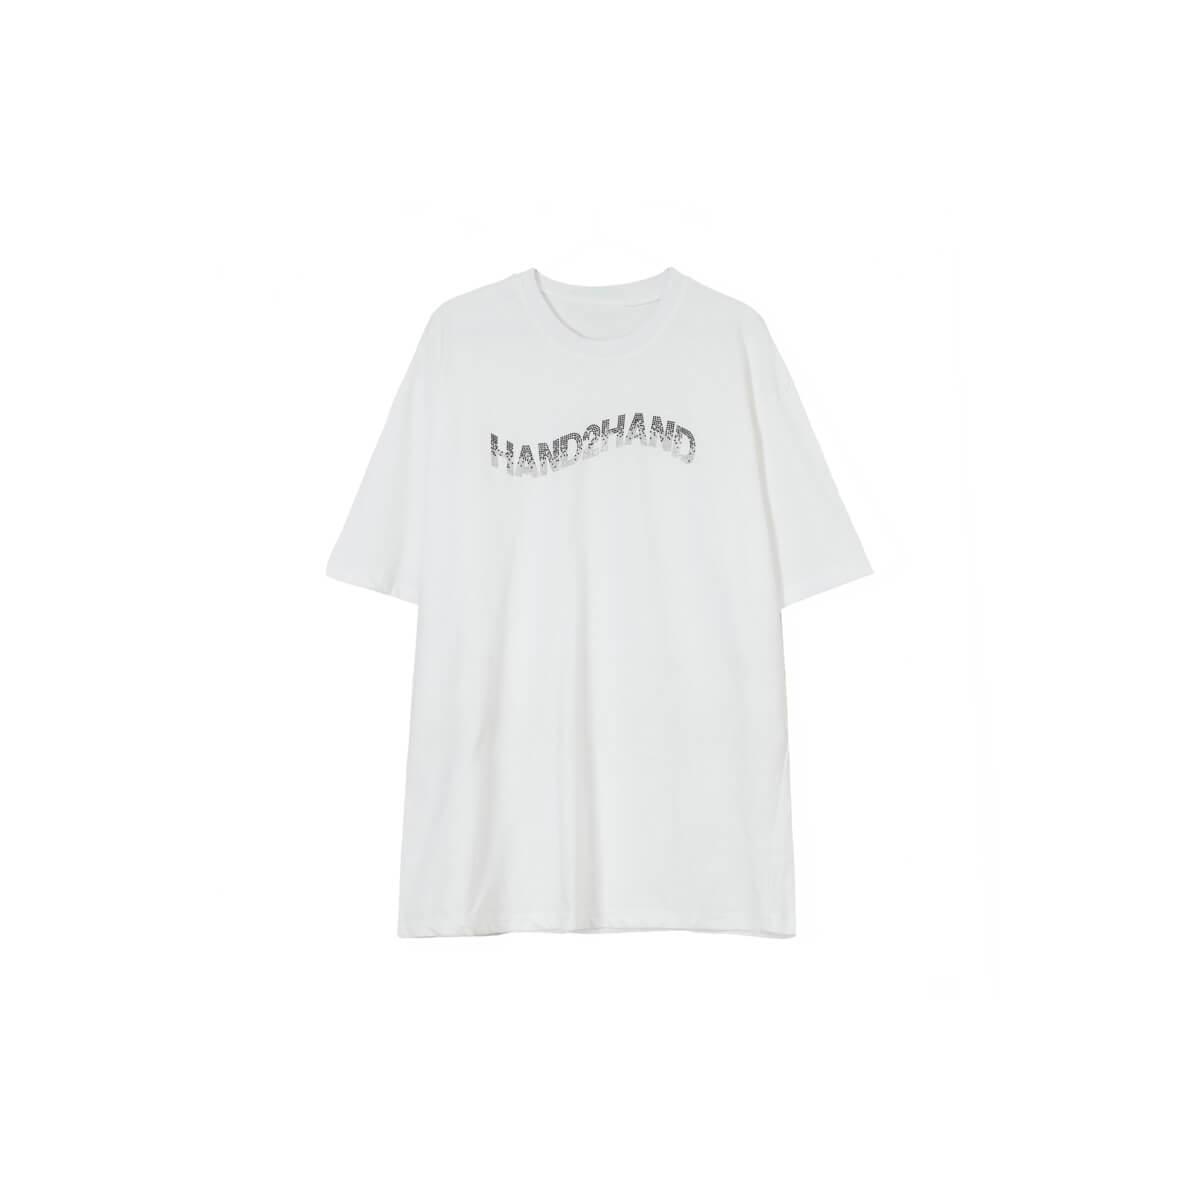 Футболка Cui Layout Studio T-shirt Inlaid Hand2hand Print White